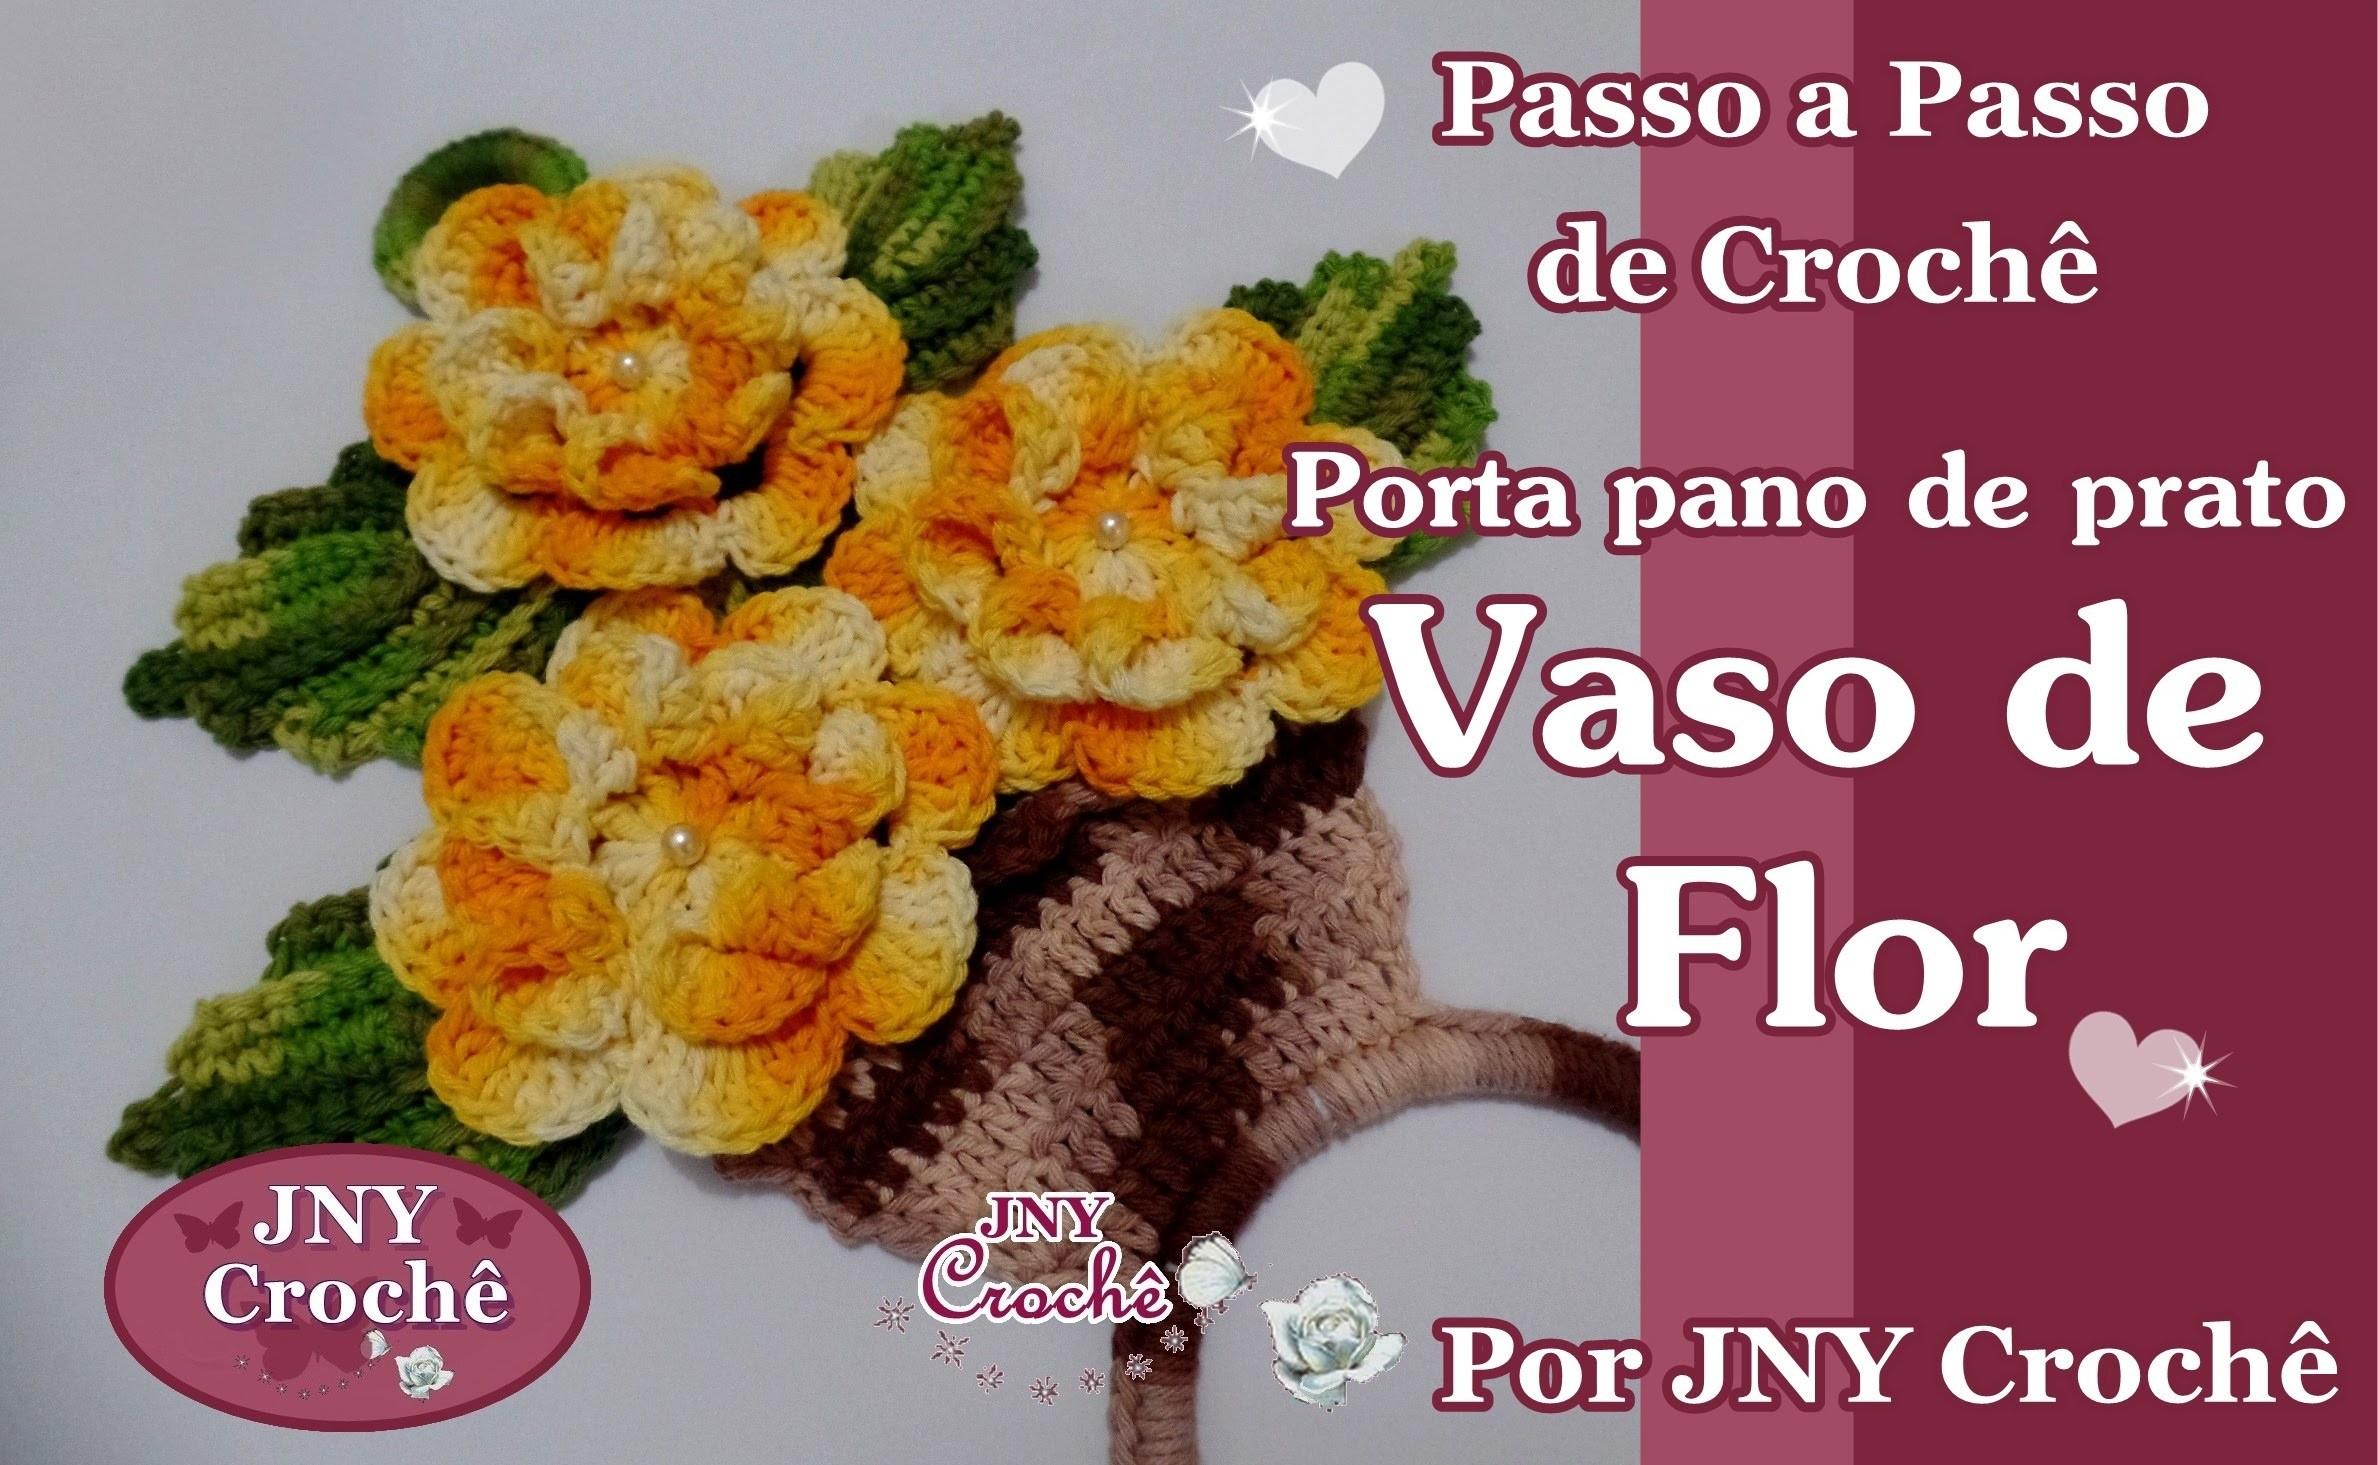 Porta pano de prato de crochê Vaso de Flor por JNY Crochê